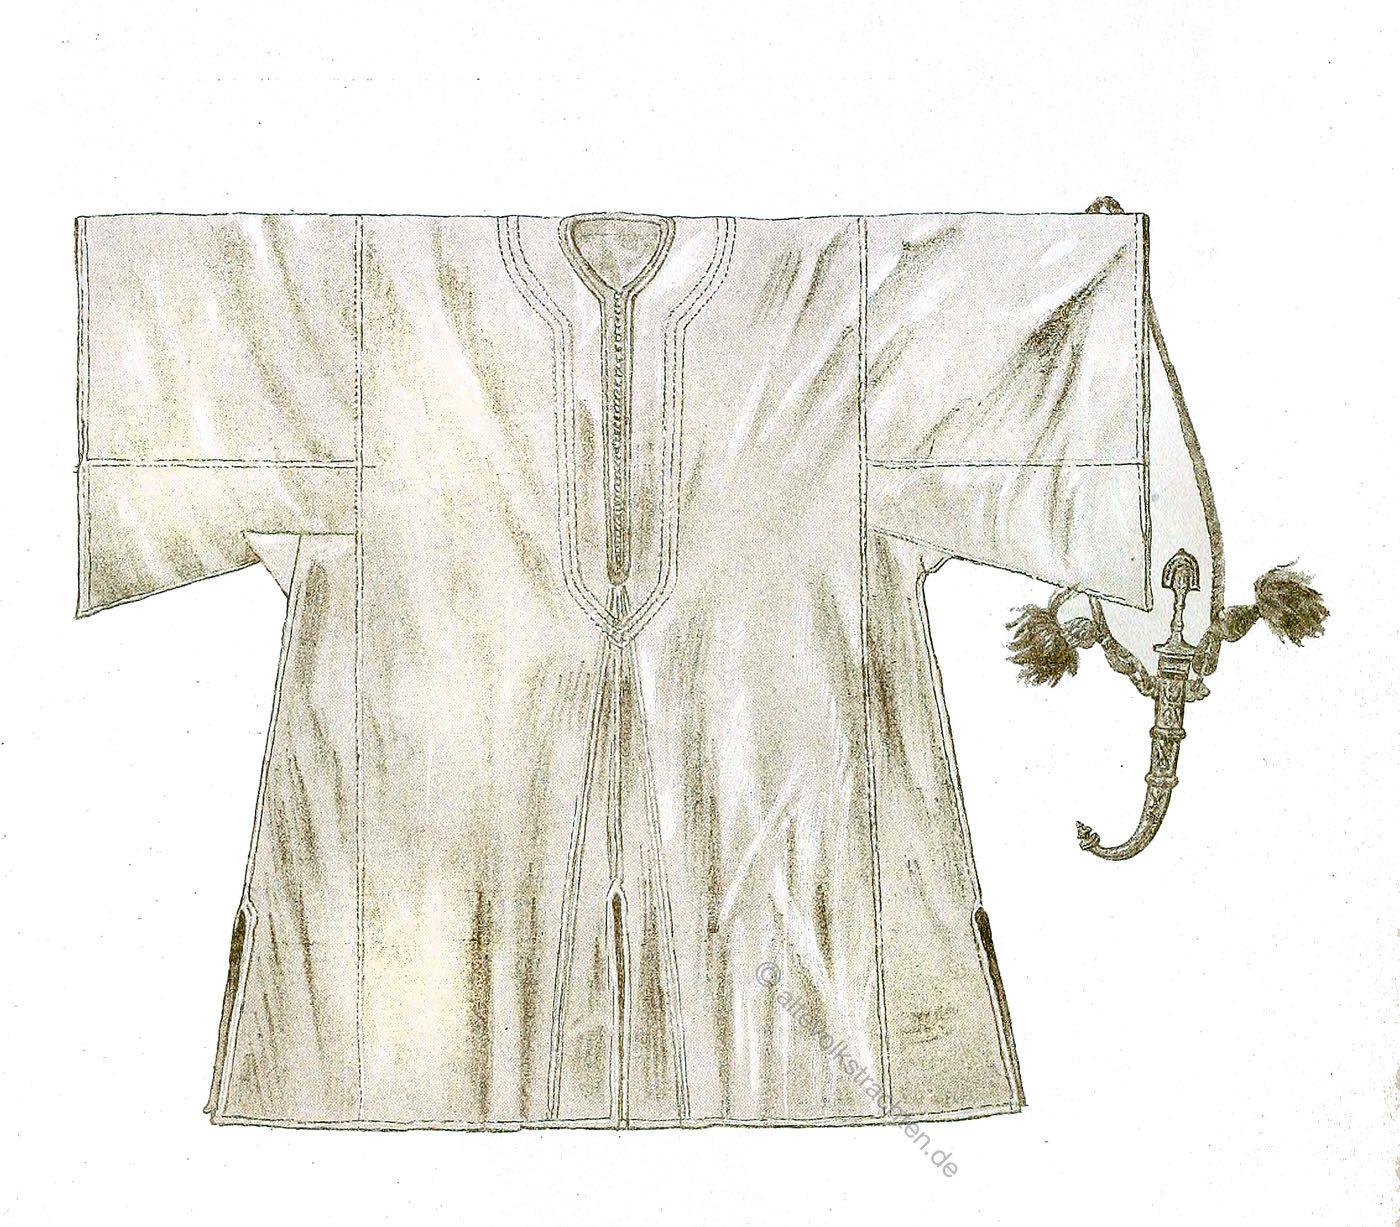 Farasia, Kaftan, Traditionell, Nordafrika, Marokko, Tracht, Max Tilke, Oriental costumes